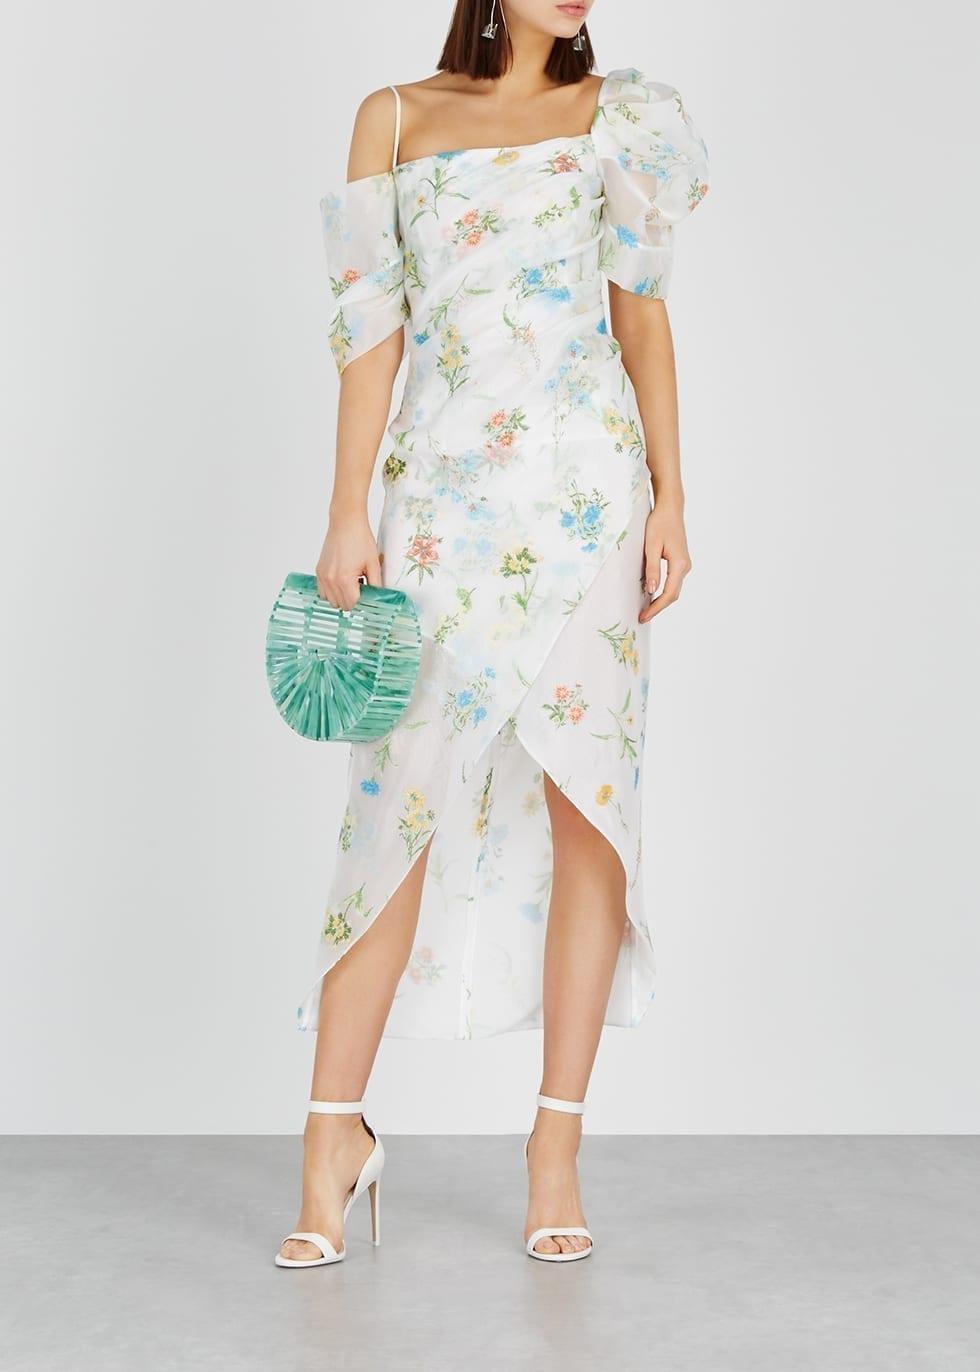 REJINA PYO Layla Floral Organza Off White Dress